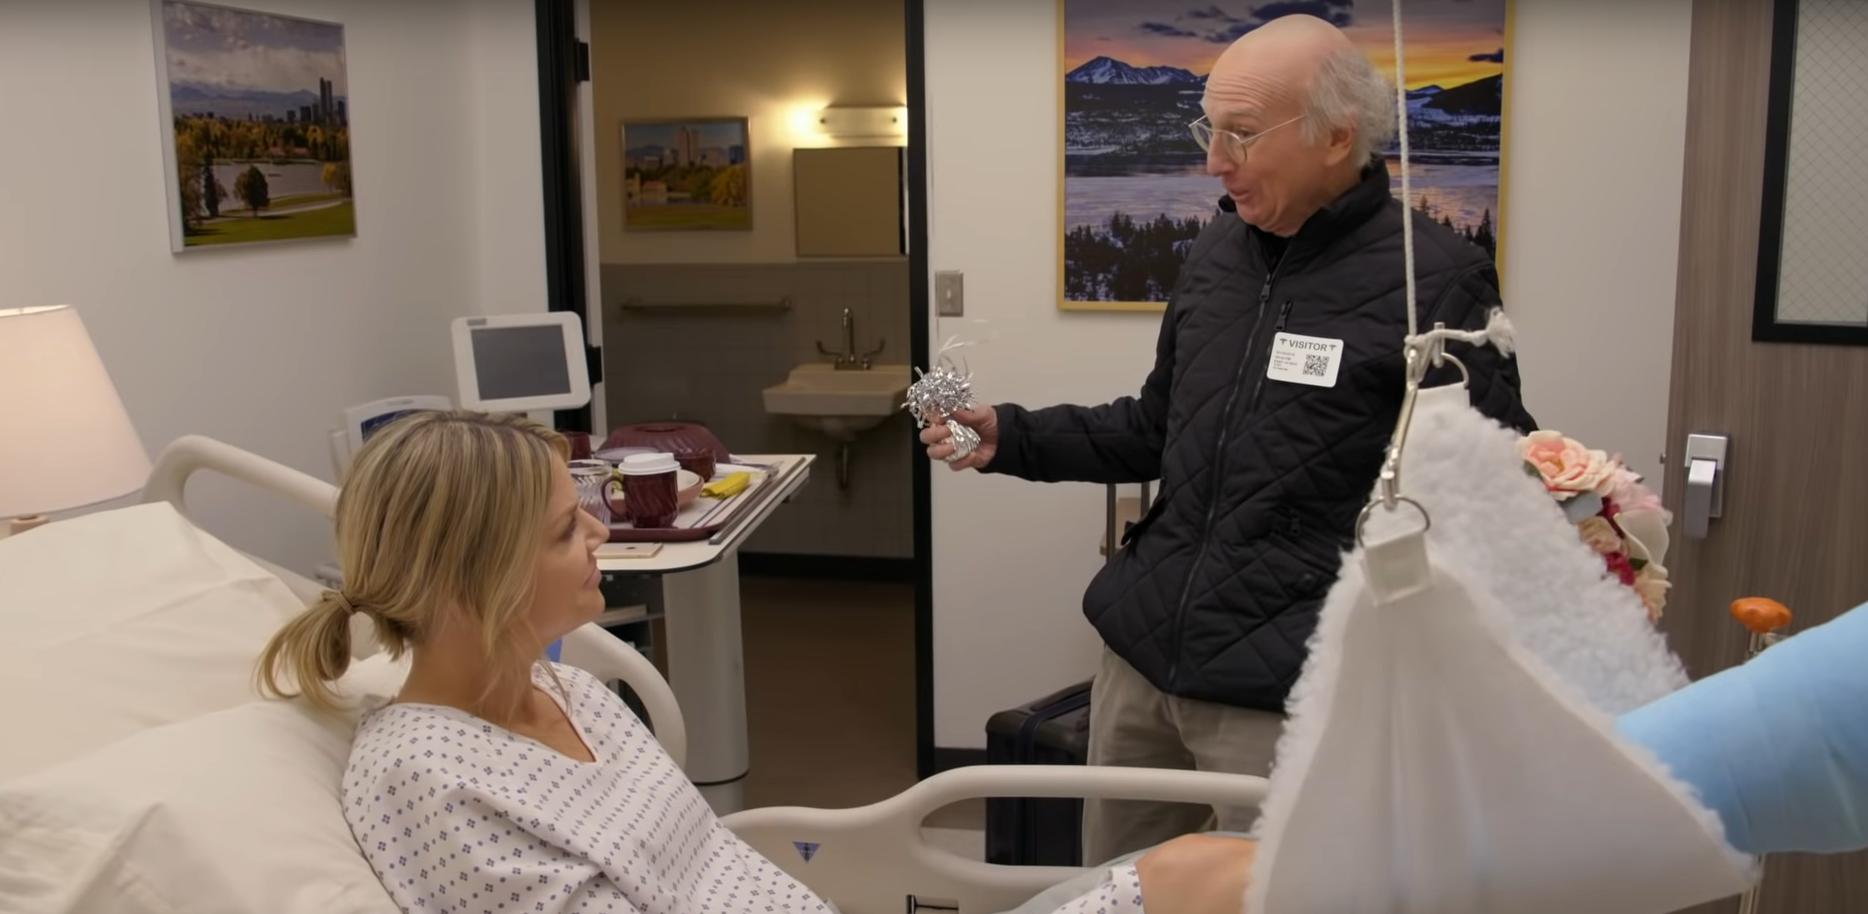 'Curb Your Enthusiasm' Season 10 Trailer Teases New Celebrity Cameos, Plenty of F-Bombs